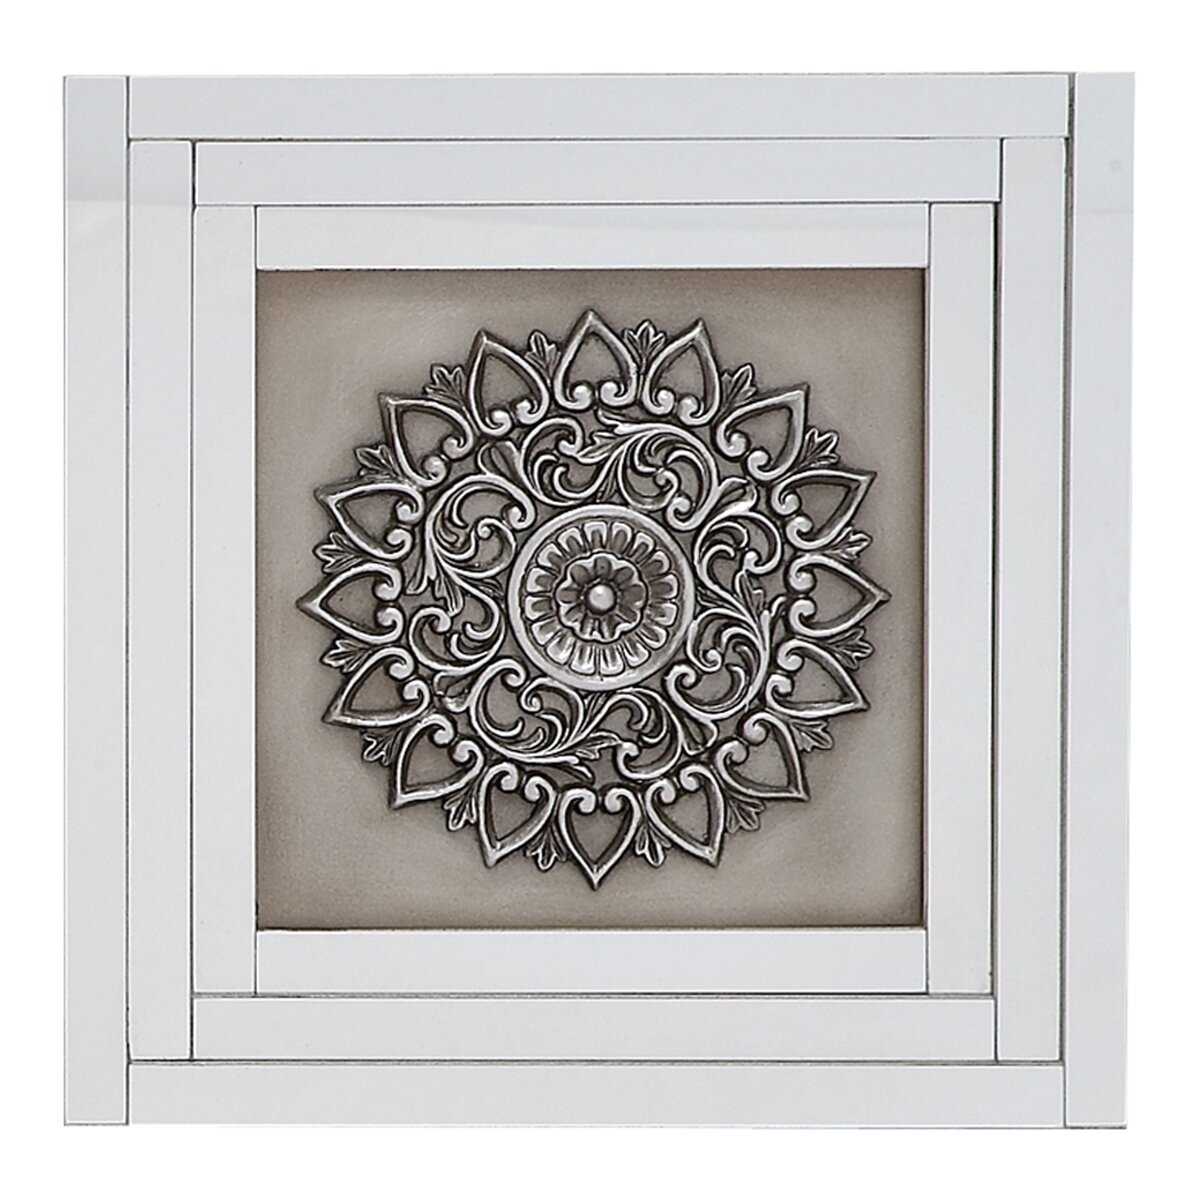 3 piece morocann mirrored wall decor panel set wayfair. Black Bedroom Furniture Sets. Home Design Ideas